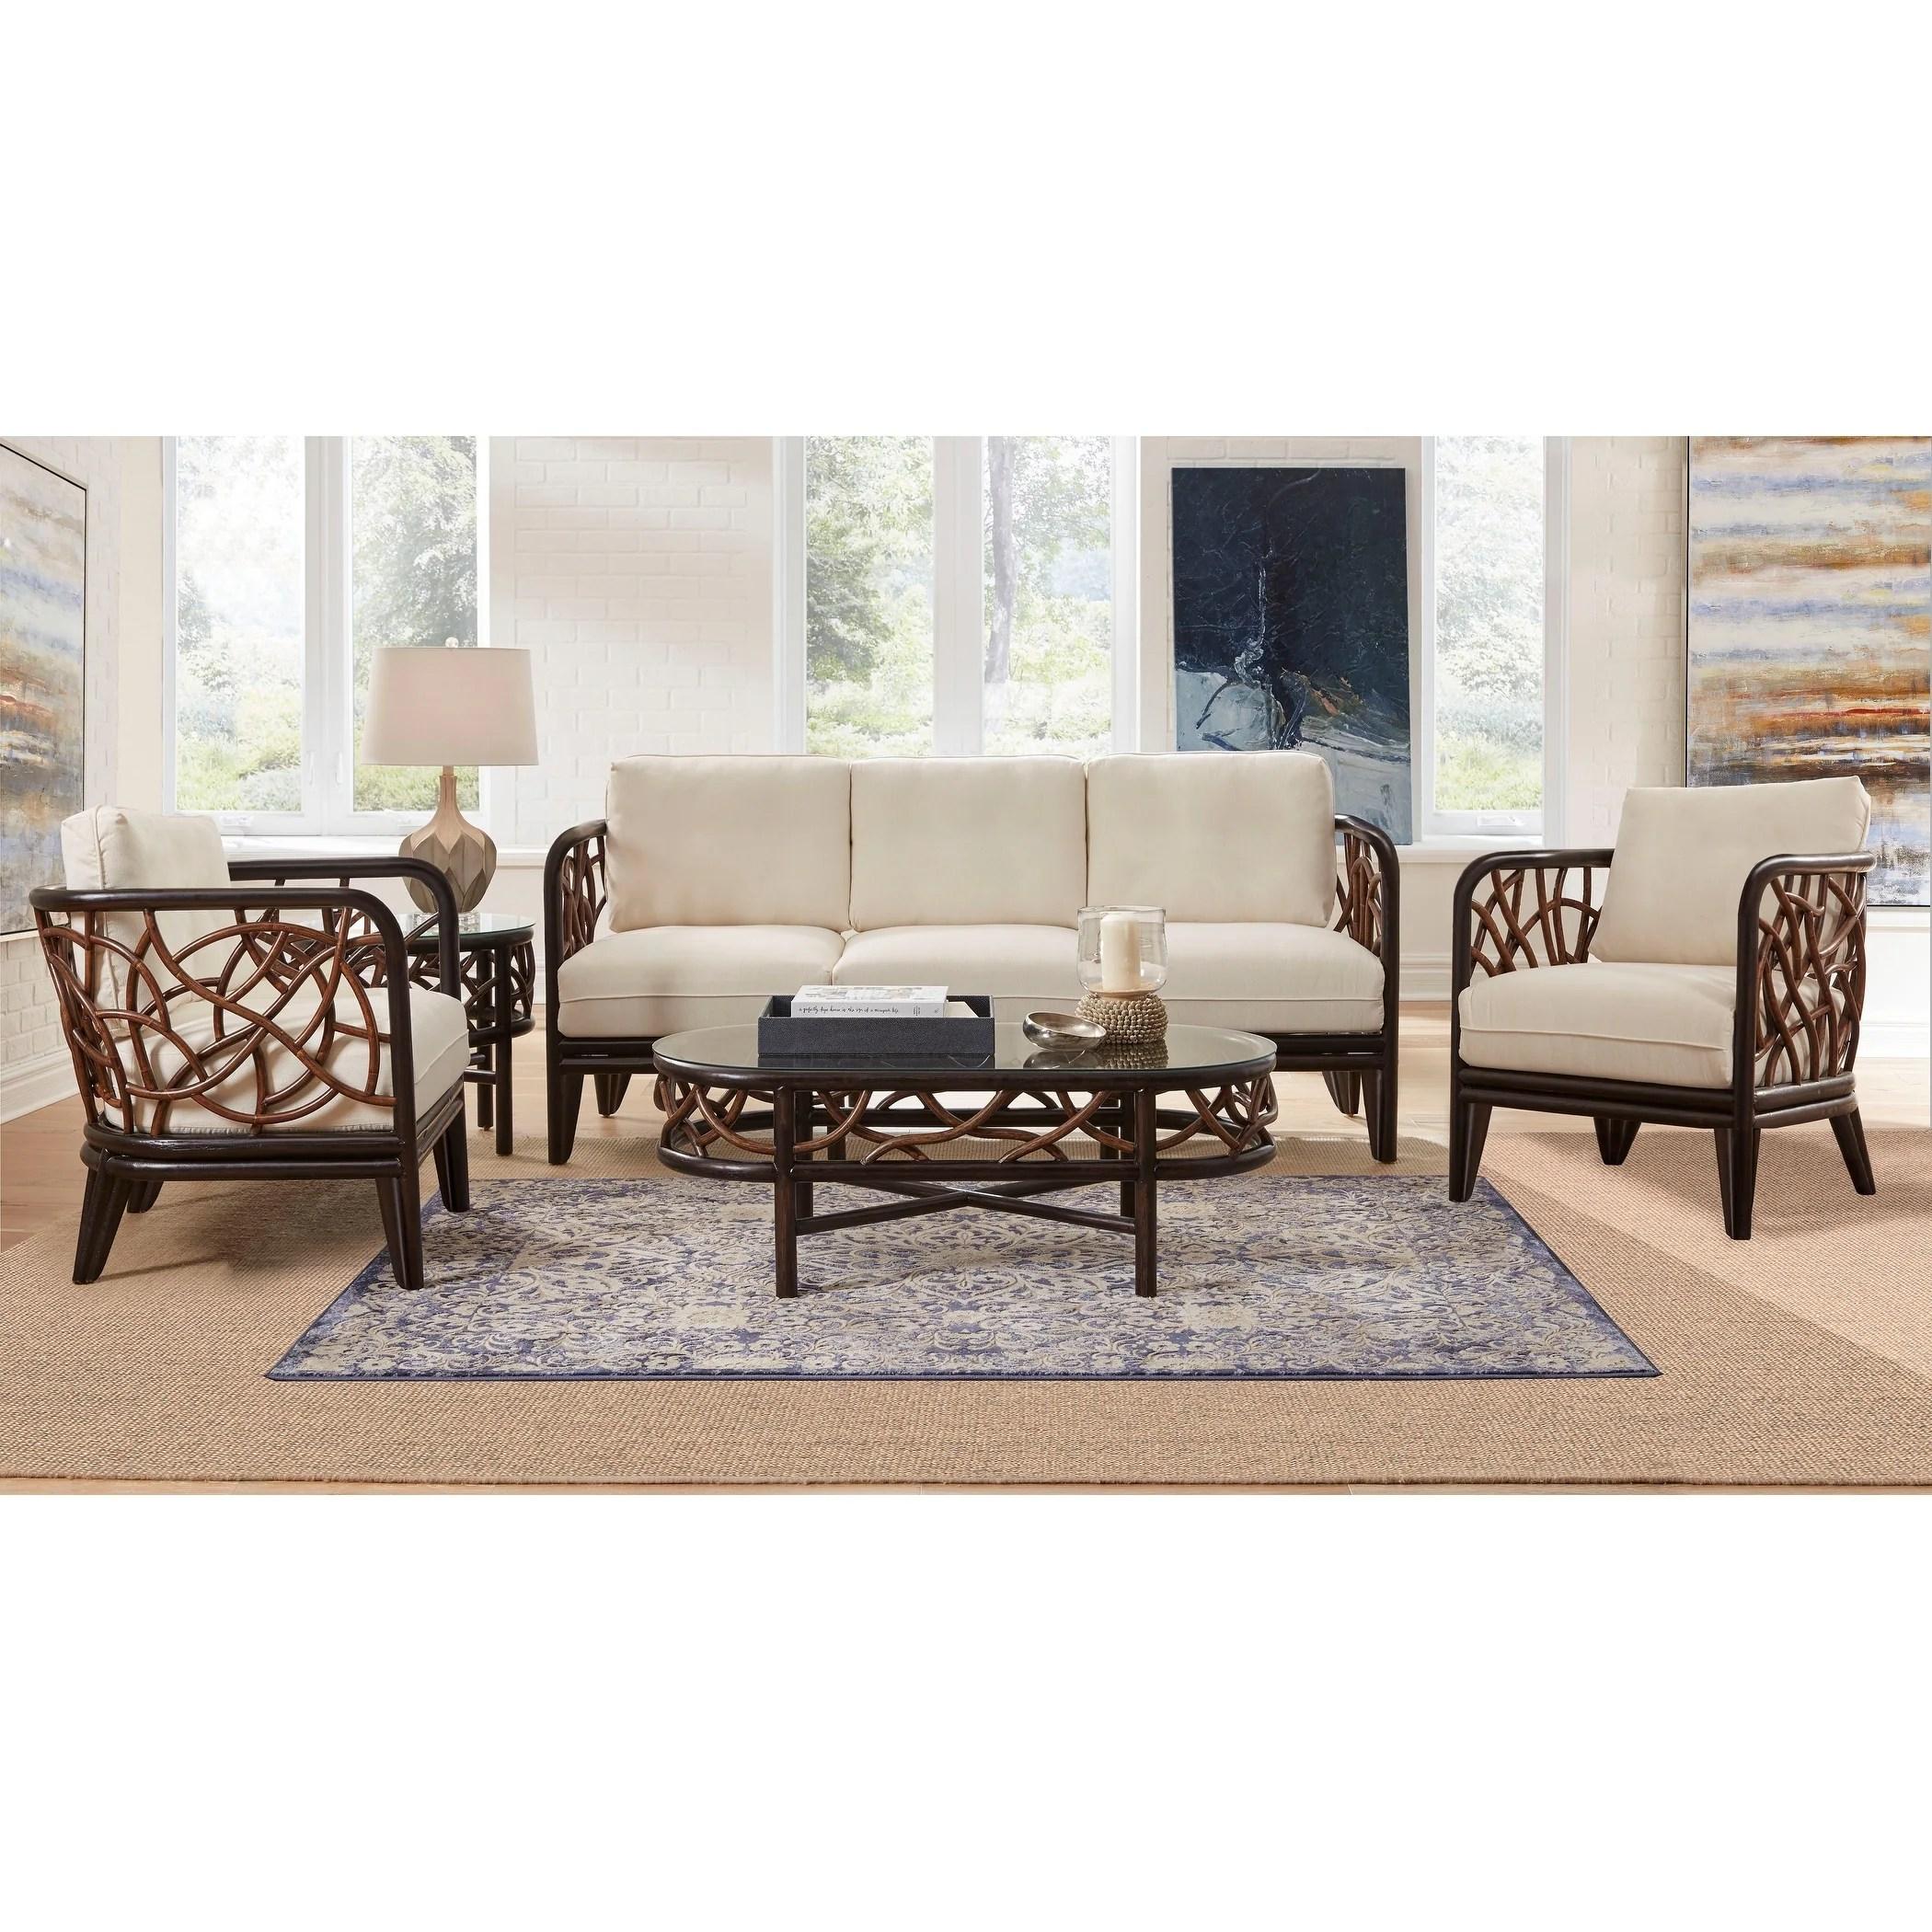 Shop Westfield Home Panama Jack Original Sevilla Blueberry Oversized Rug 12 X 15 On Sale Overstock 23540337